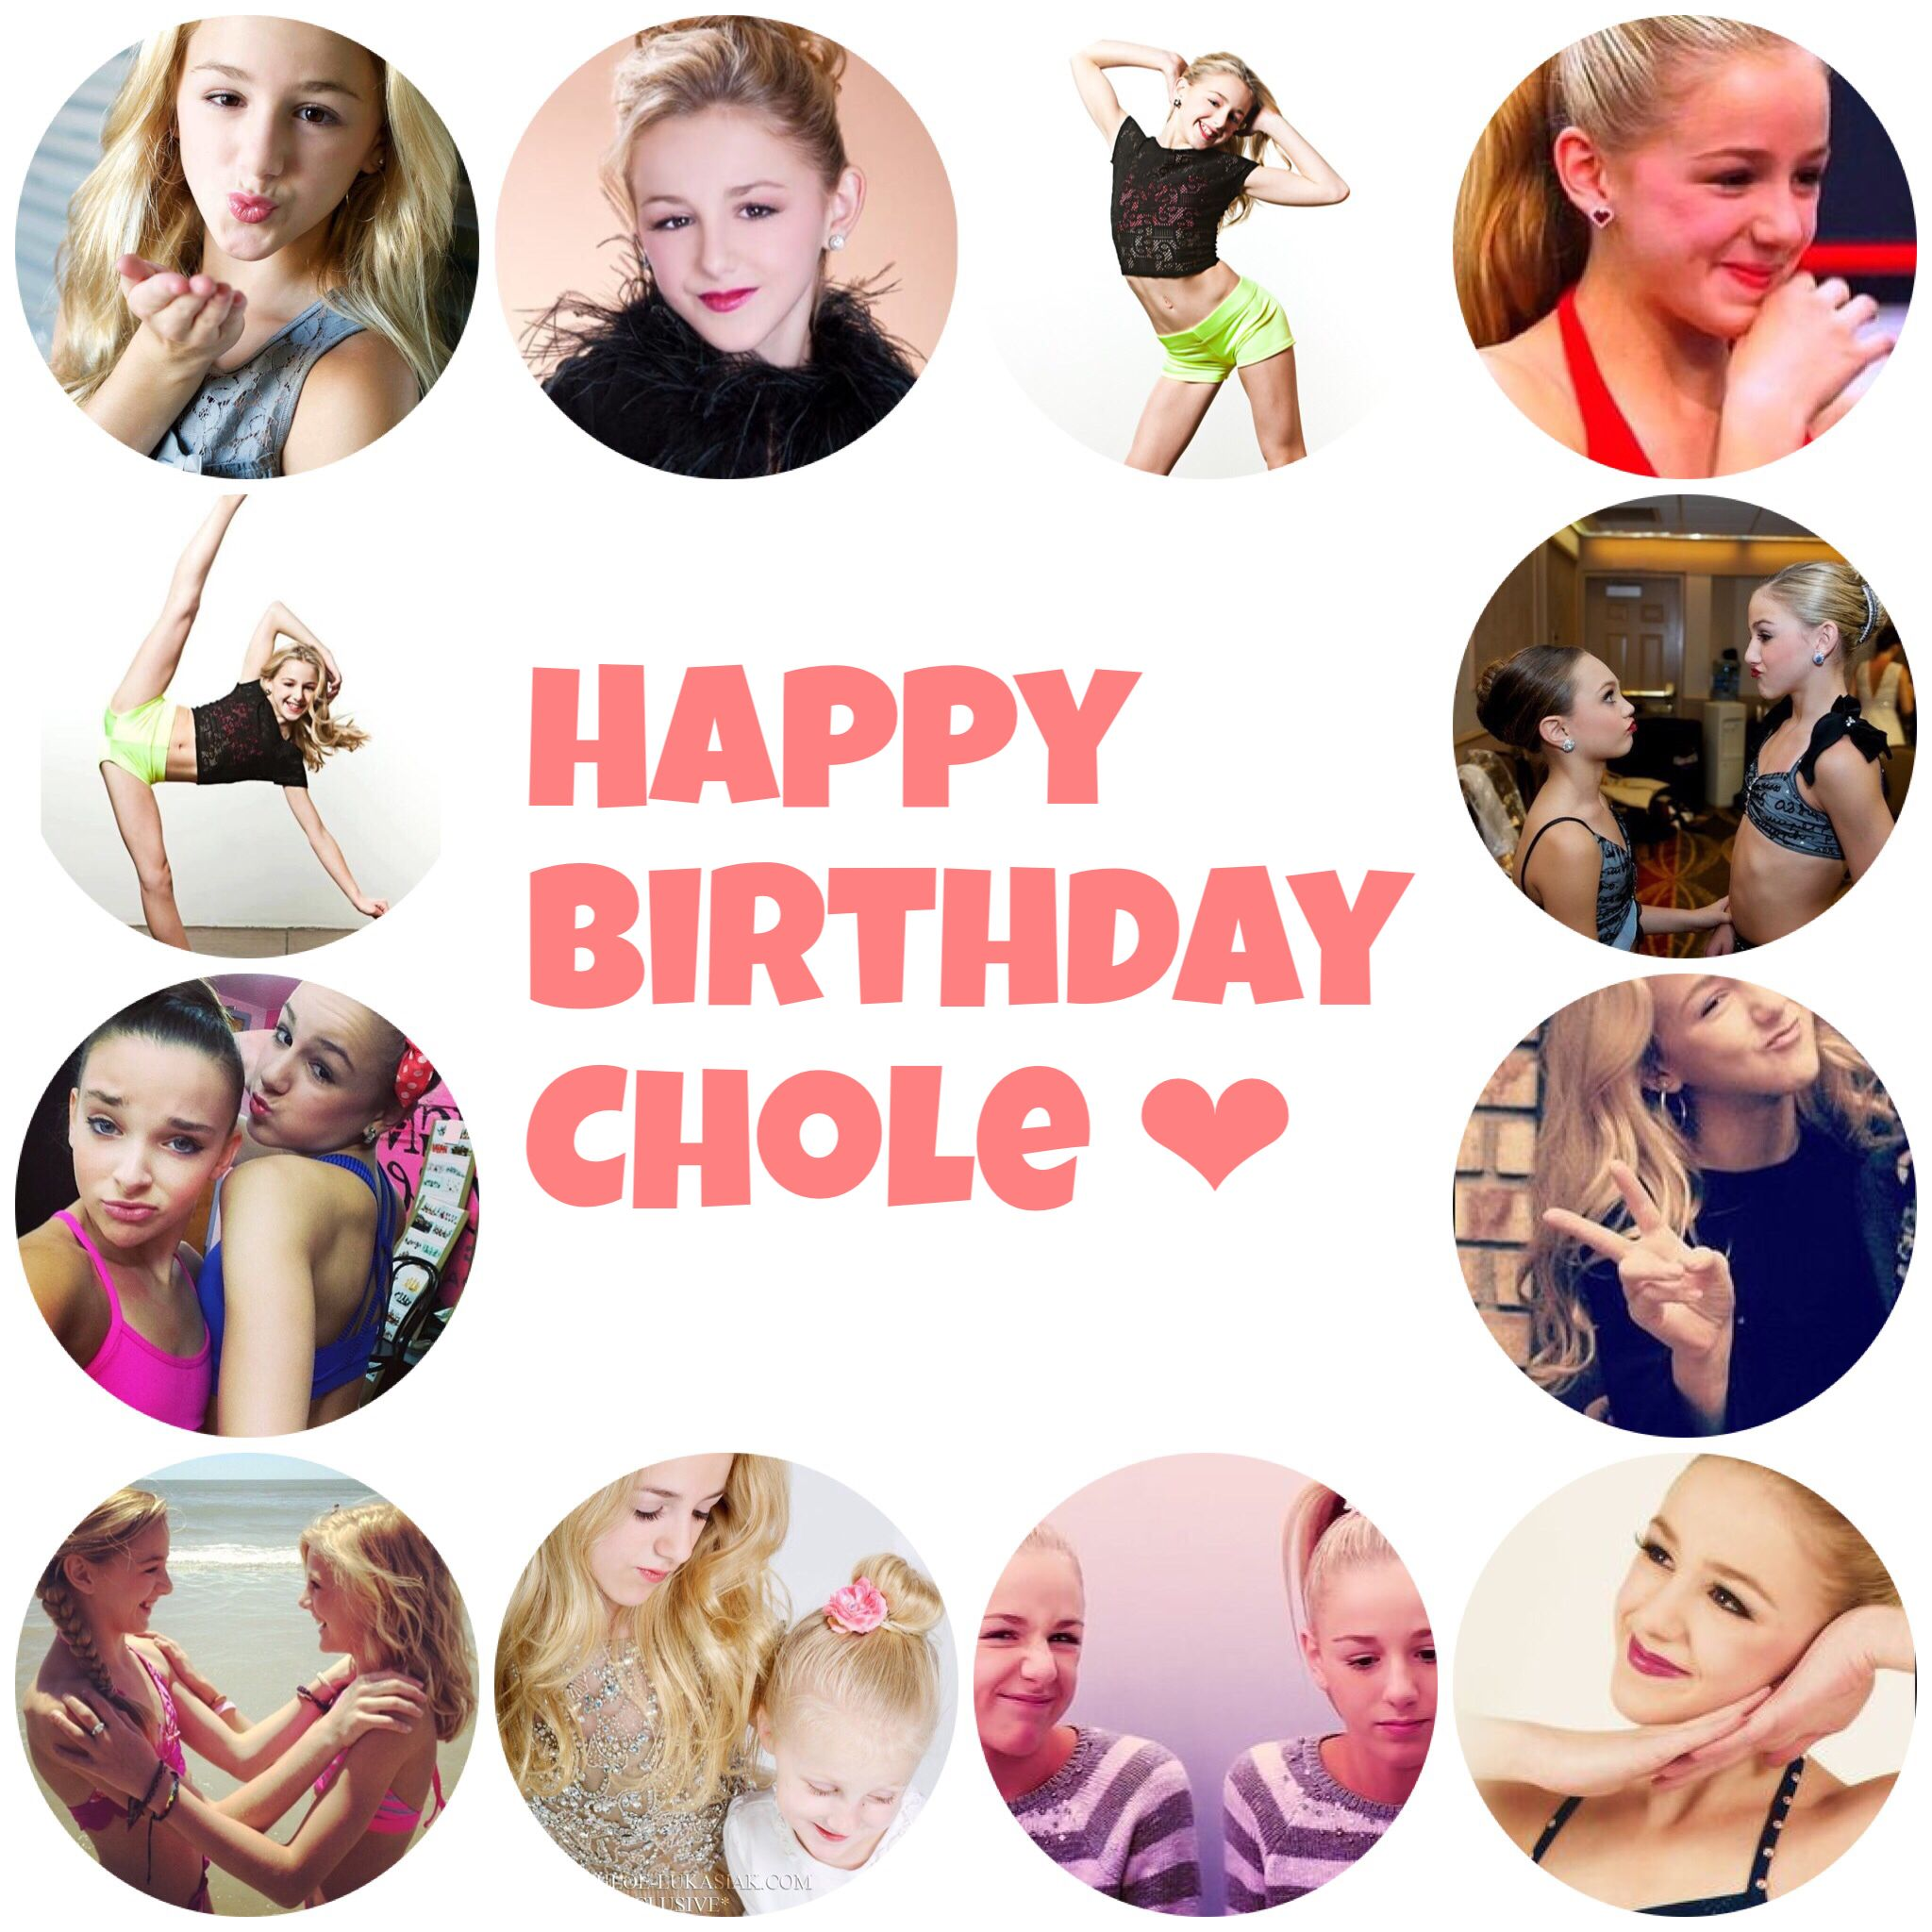 Happy birthday chole